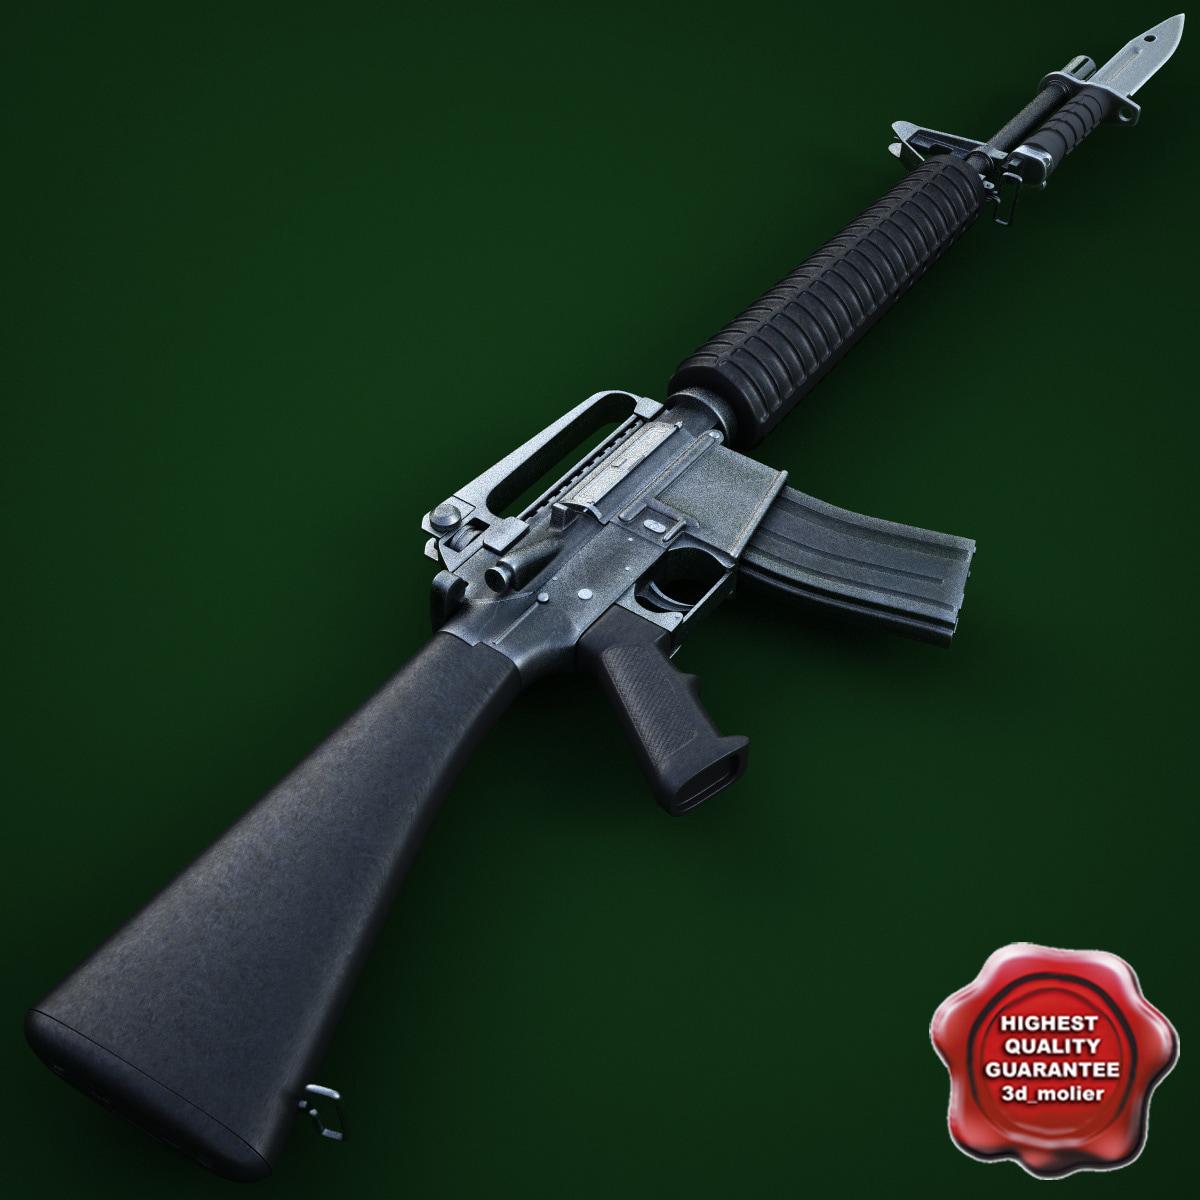 M4_Carbine_with_M9_Bayonet_00.jpg